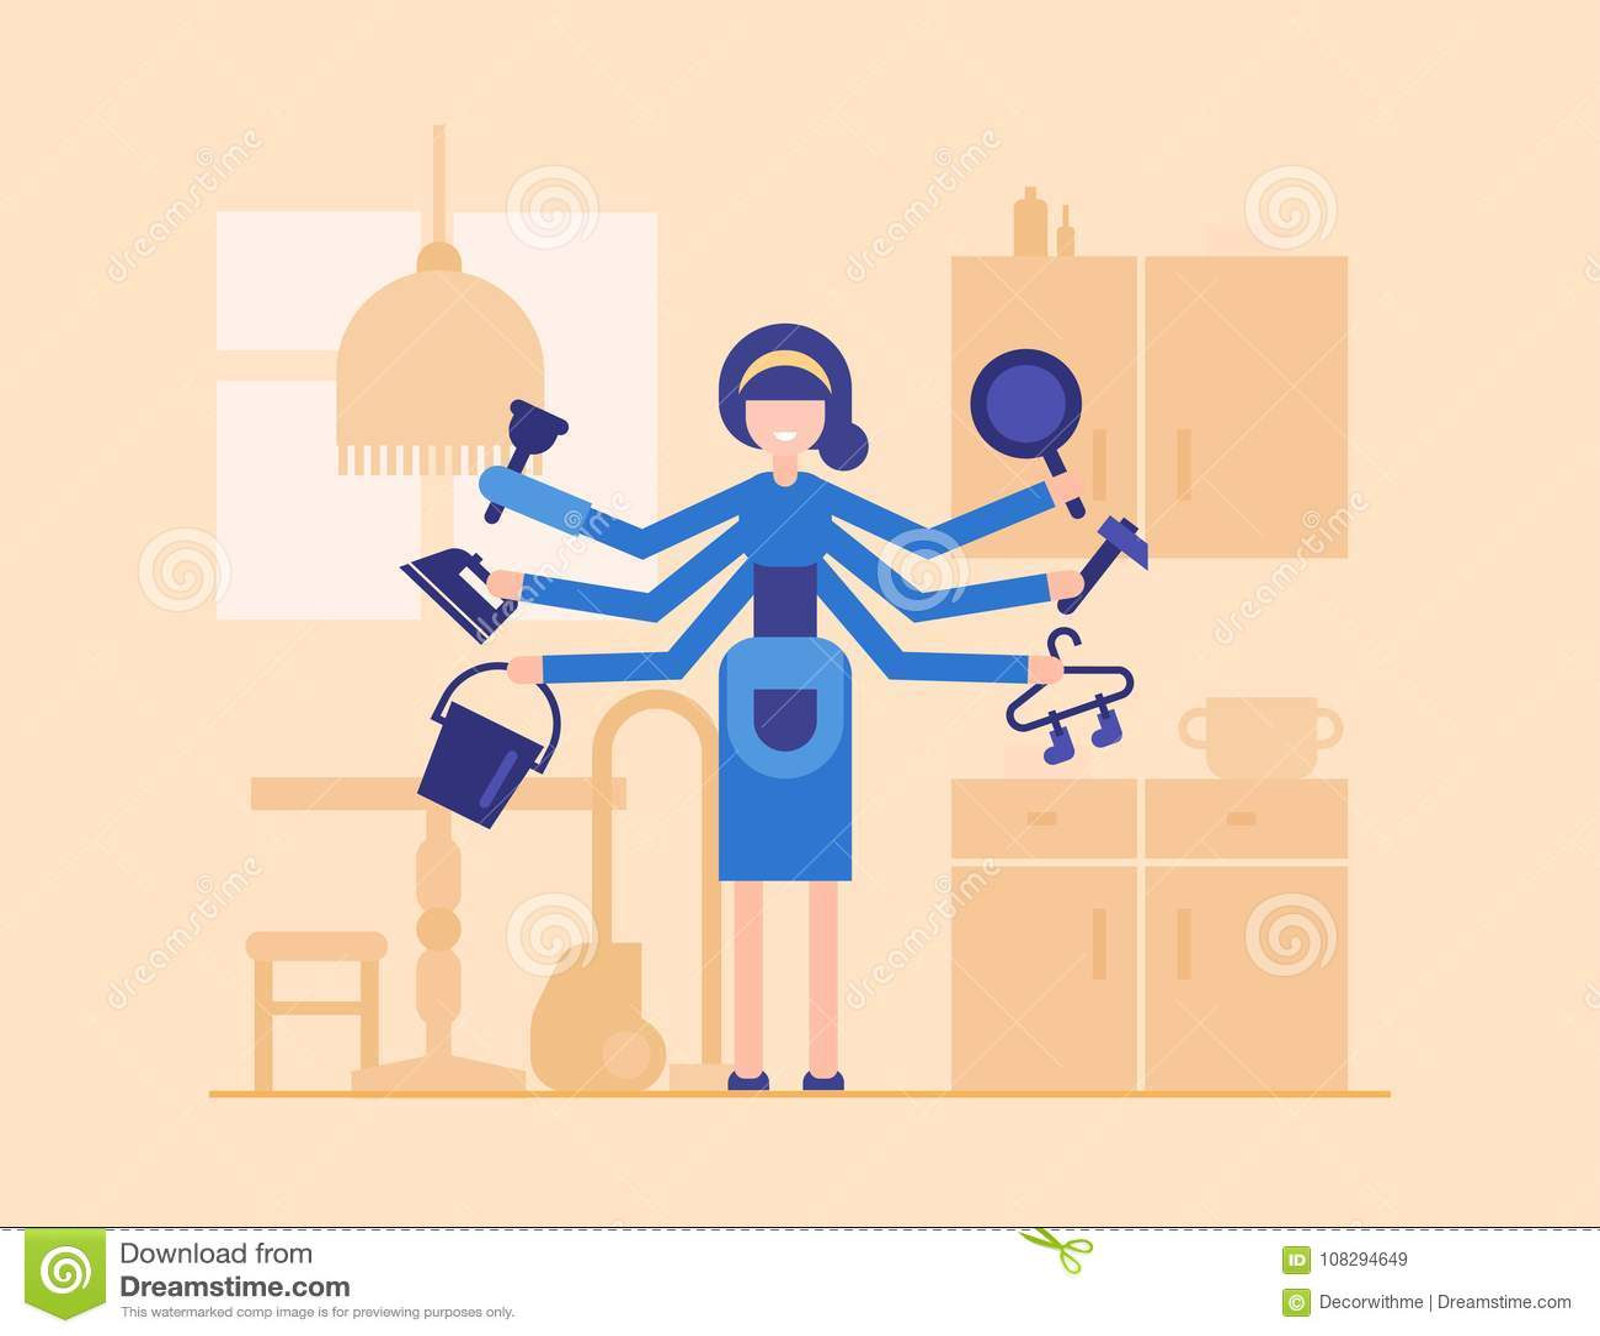 kitchen pot hangers tile countertops 主妇在厨房里 现代平的设计样式例证向量例证 插画包括有图象 女性 在与家具剪影的橙色背景隔绝的现代平的设计样式例证微笑的漫画人物 拿着铁 桶 平底锅 锤子 挂衣架的妇女